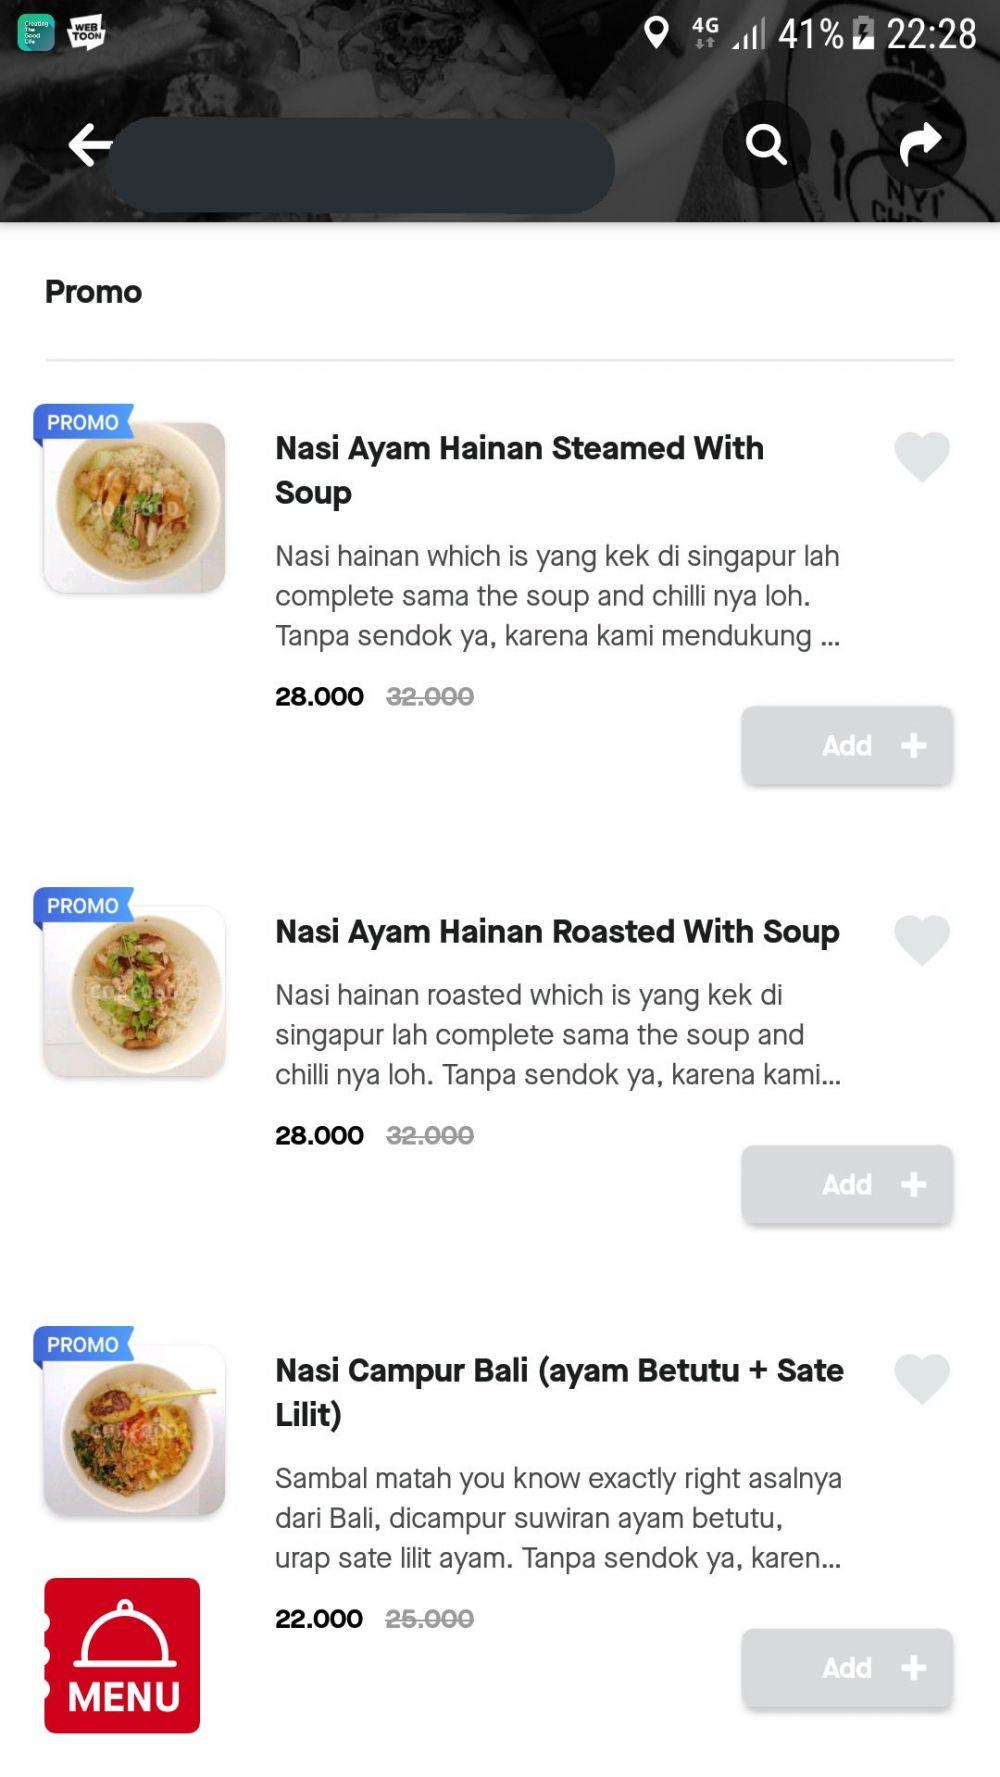 deskripsi menu makanan aplikasi ojek online © Twitter